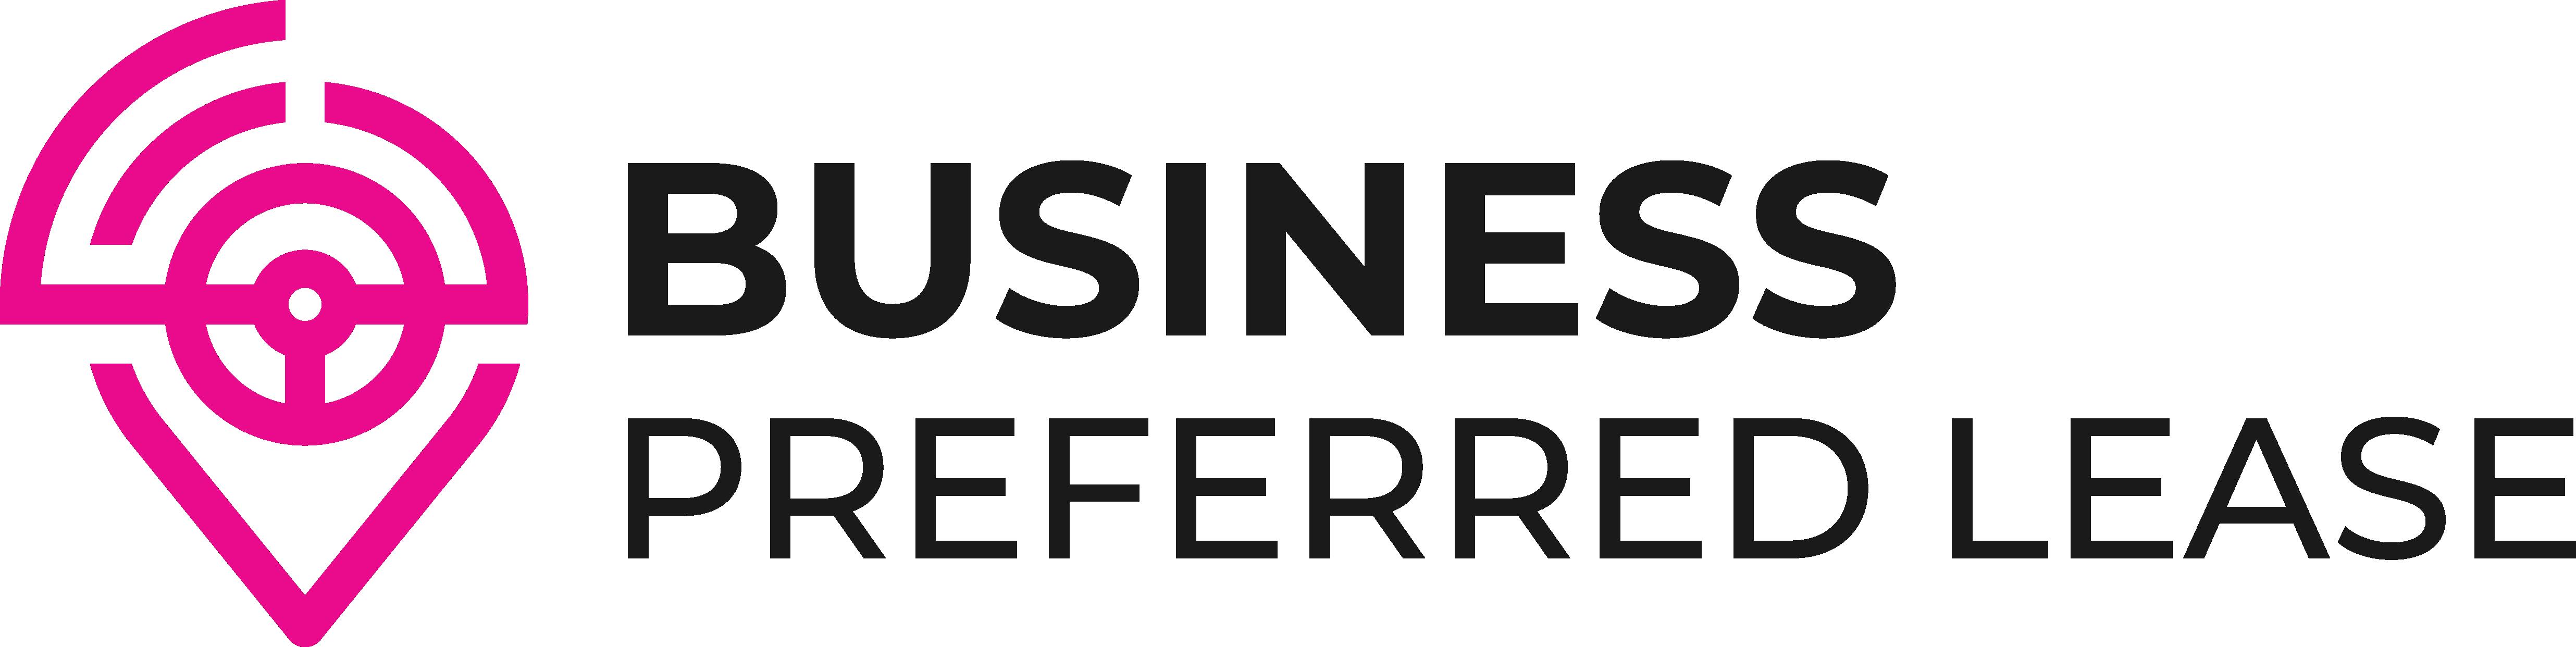 Business Preferred Lease